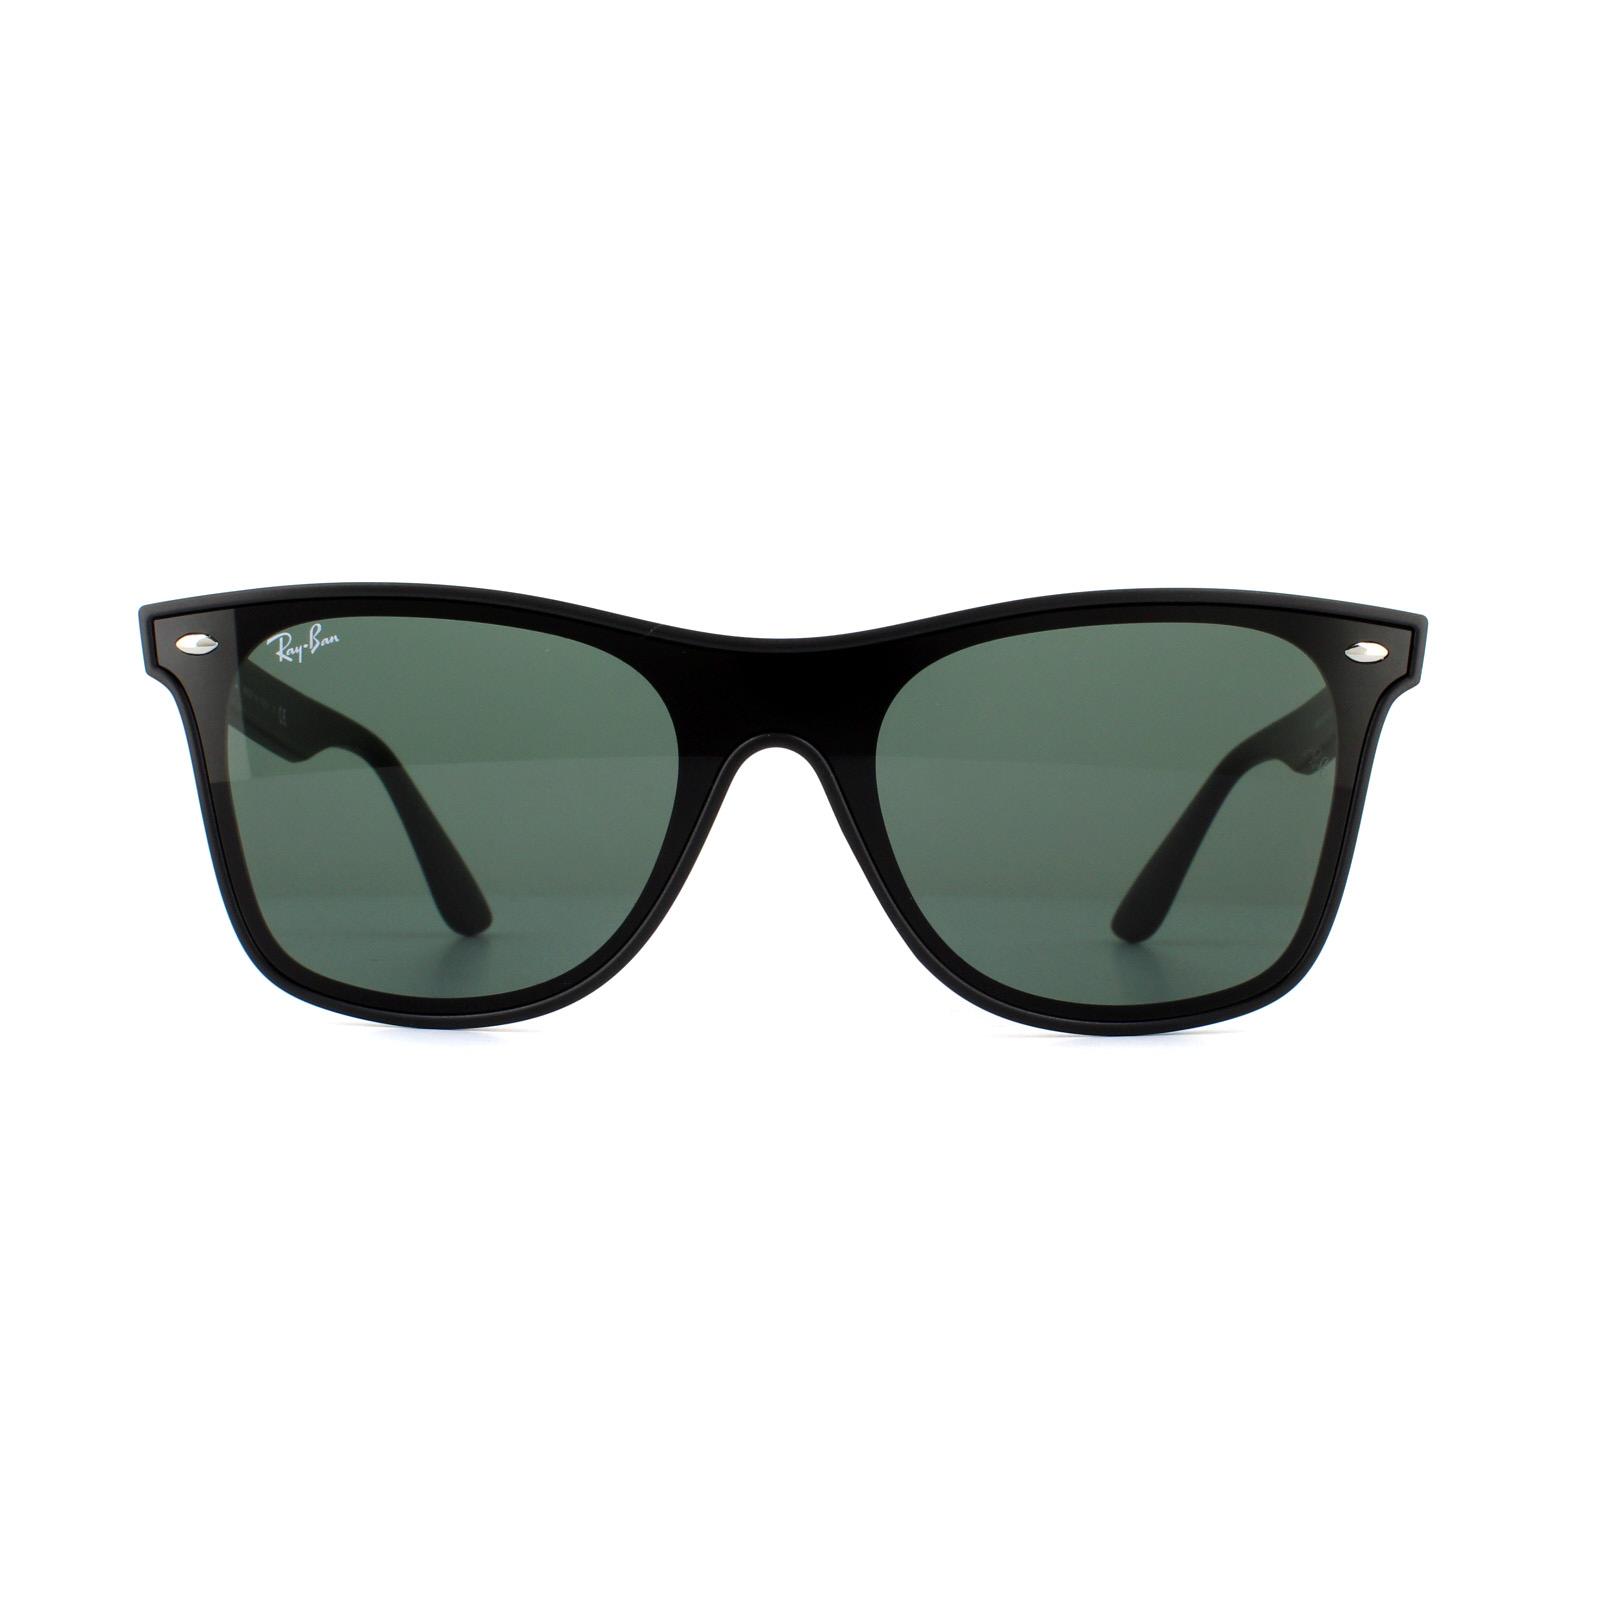 88d7aac0d1e Sentinel Ray-Ban Sunglasses Blaze Wayfarer 4440N 601 71 Black Grey Green